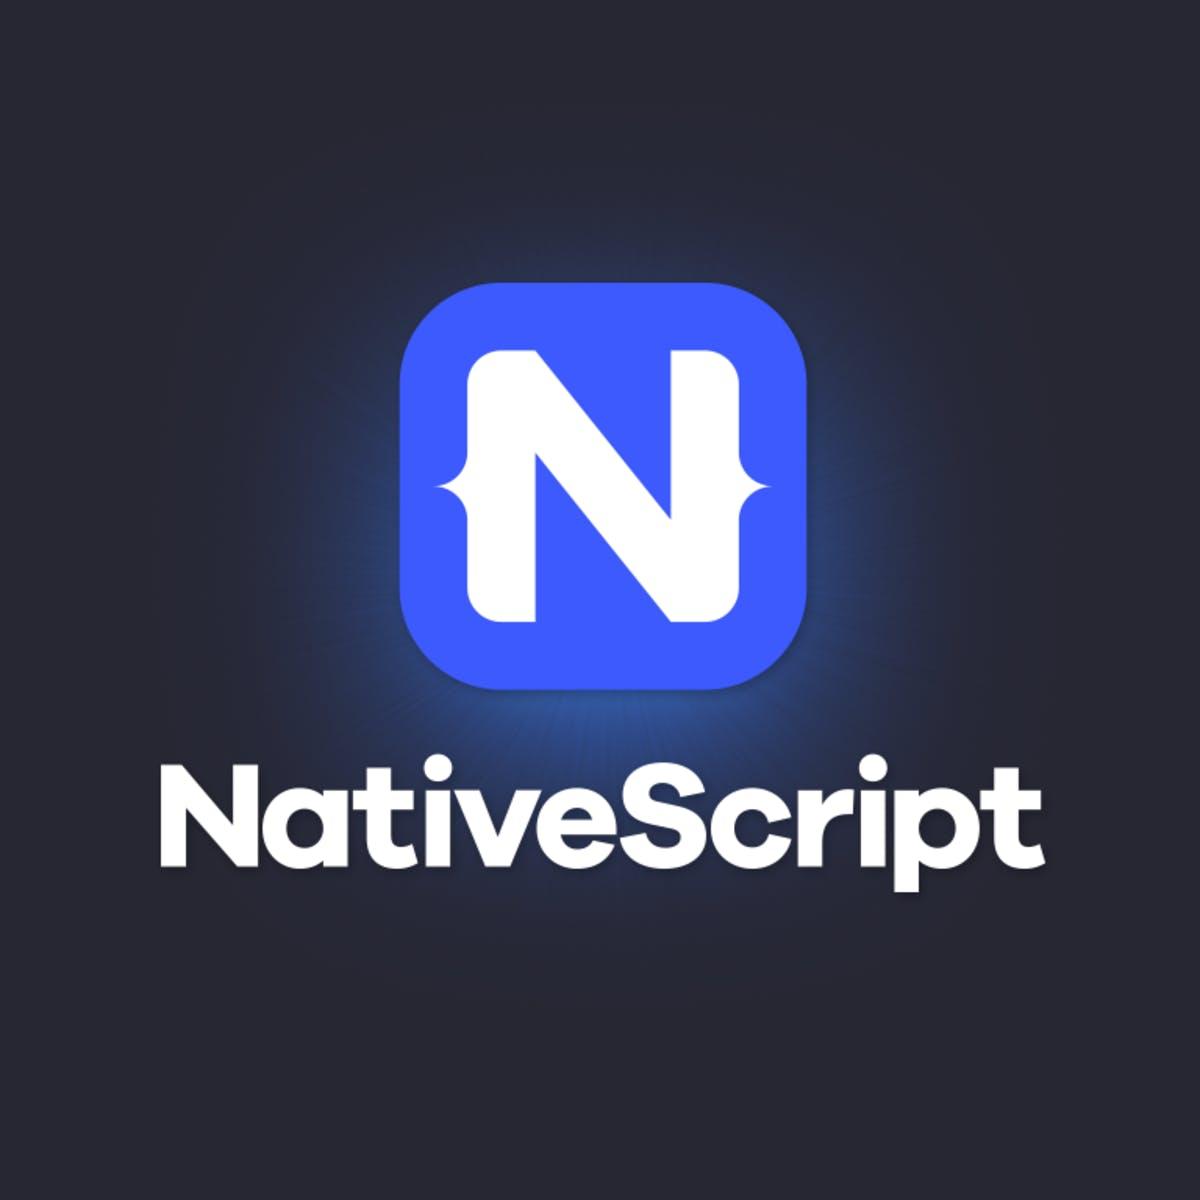 Multiplatform Mobile App Development with Web Technologies: NativeScript